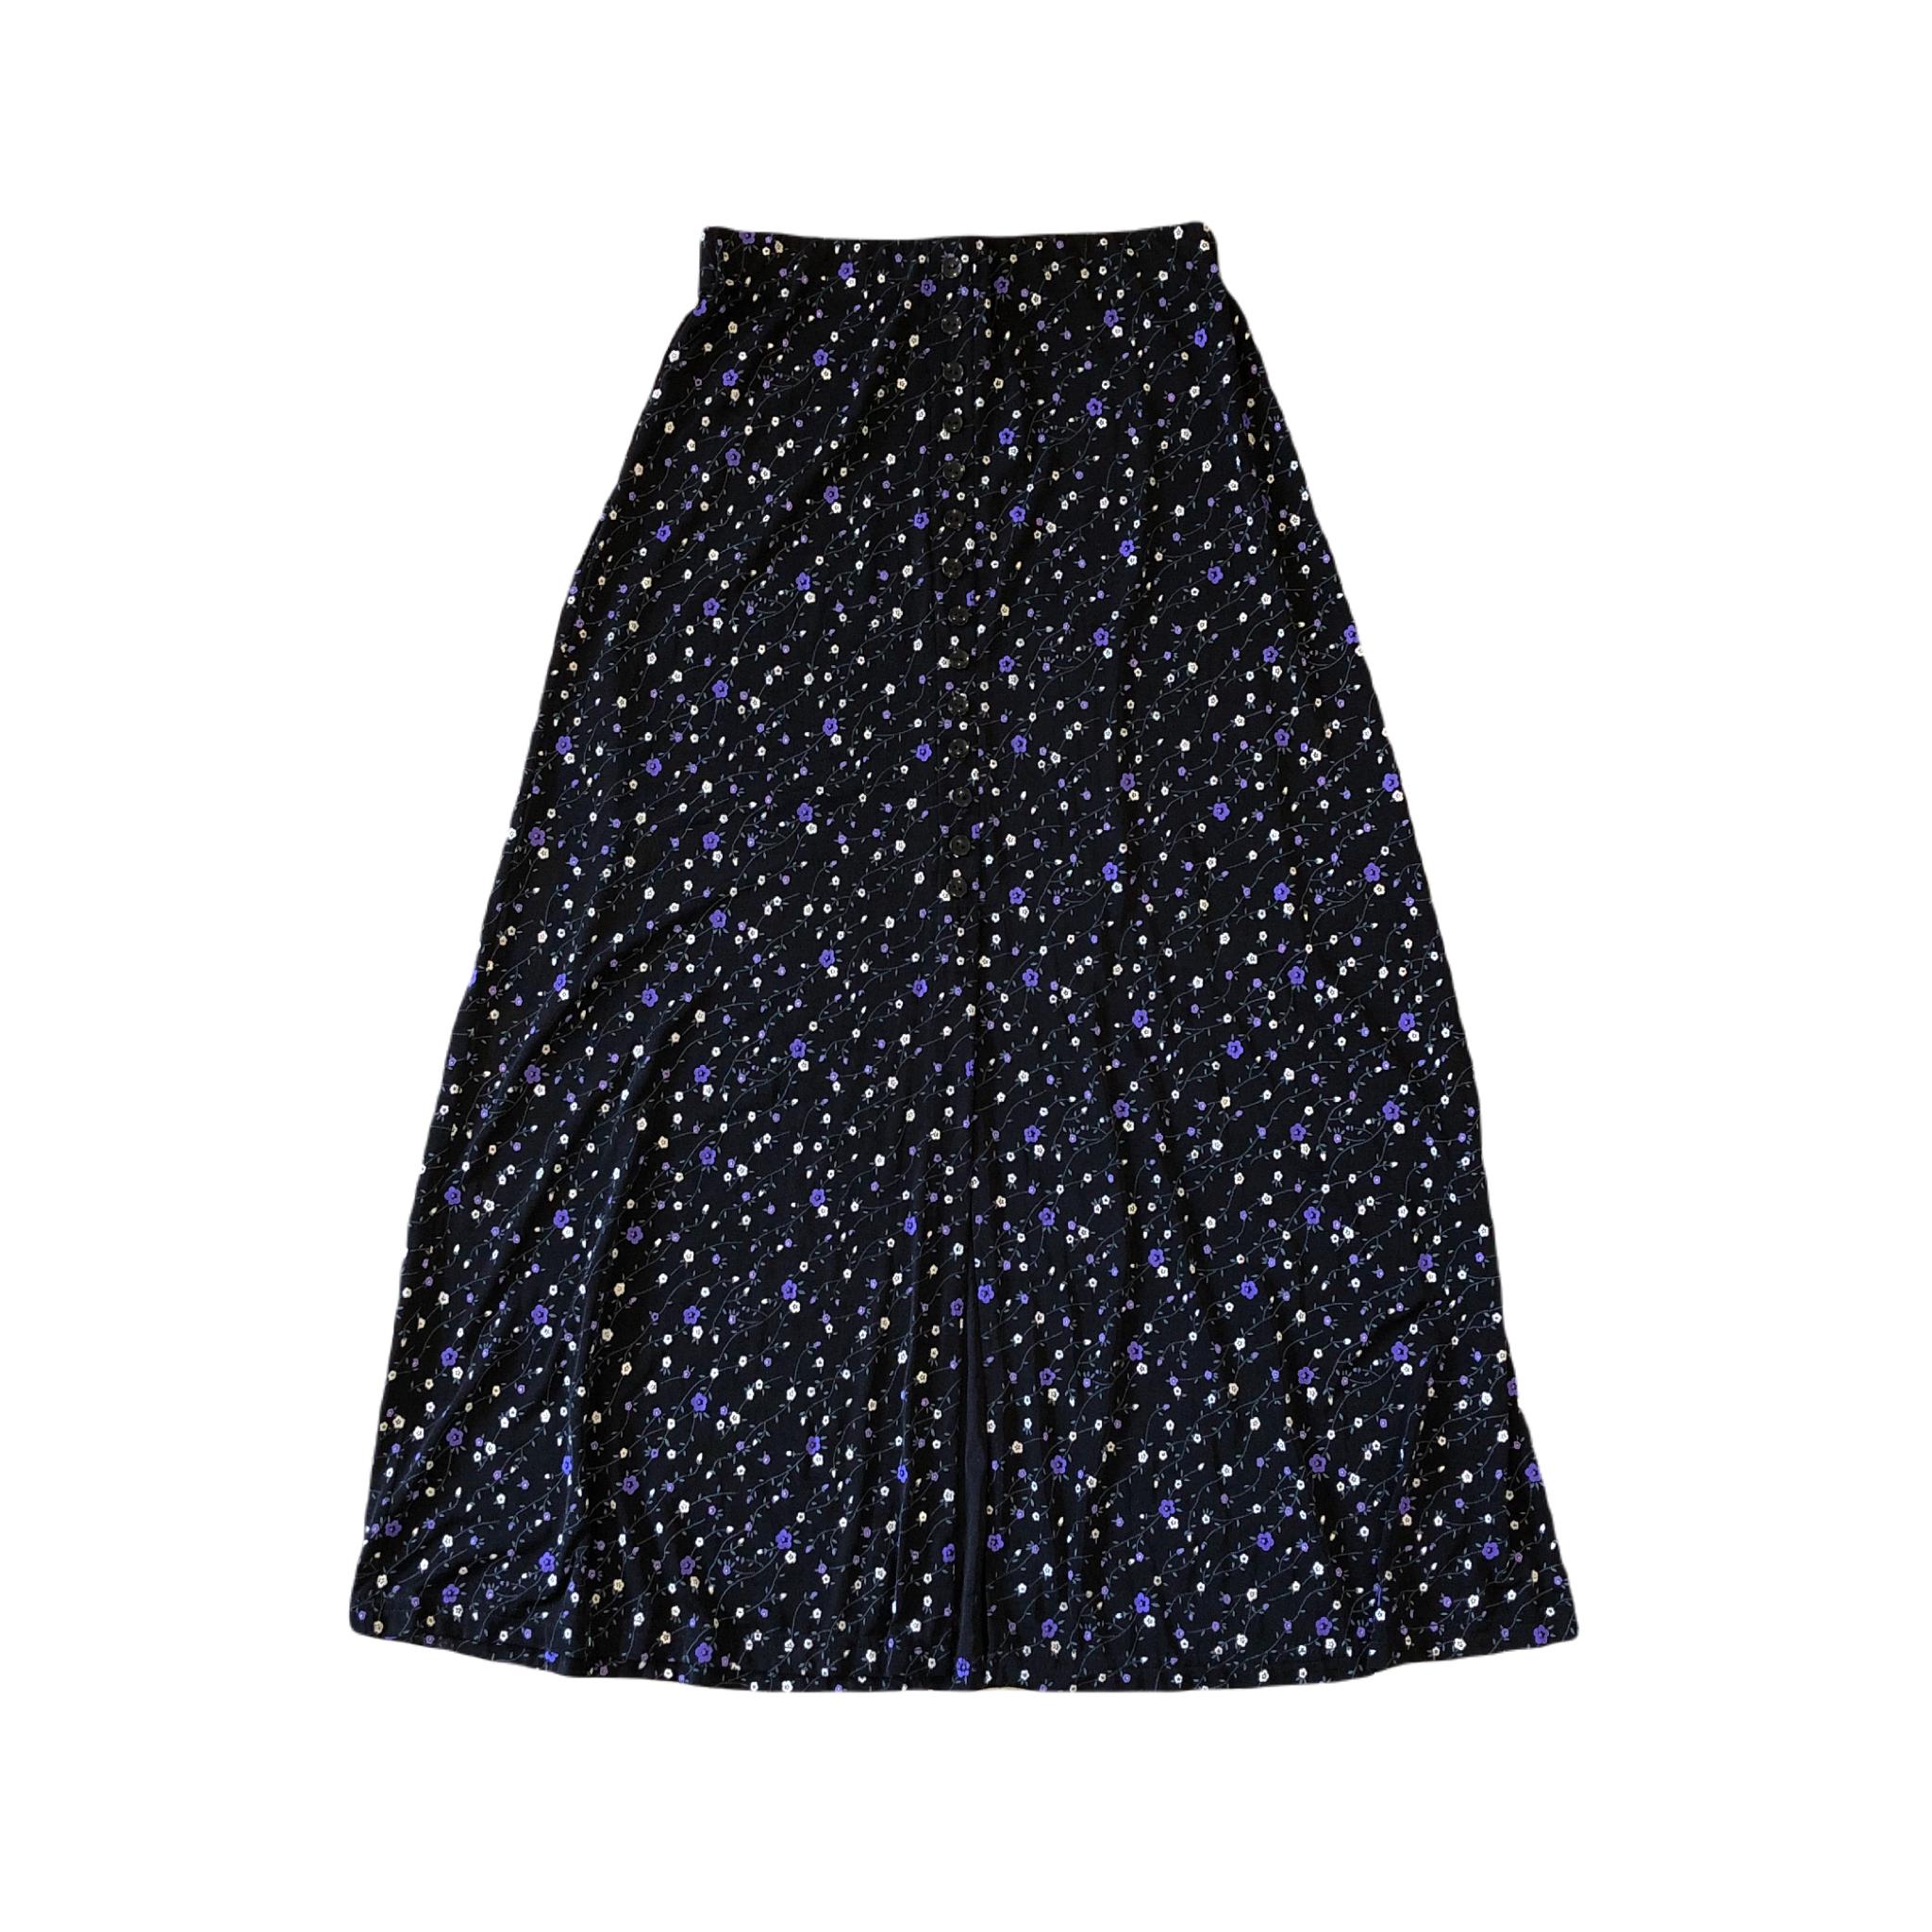 Briggs Floral Long Skirt ¥5,400+tax